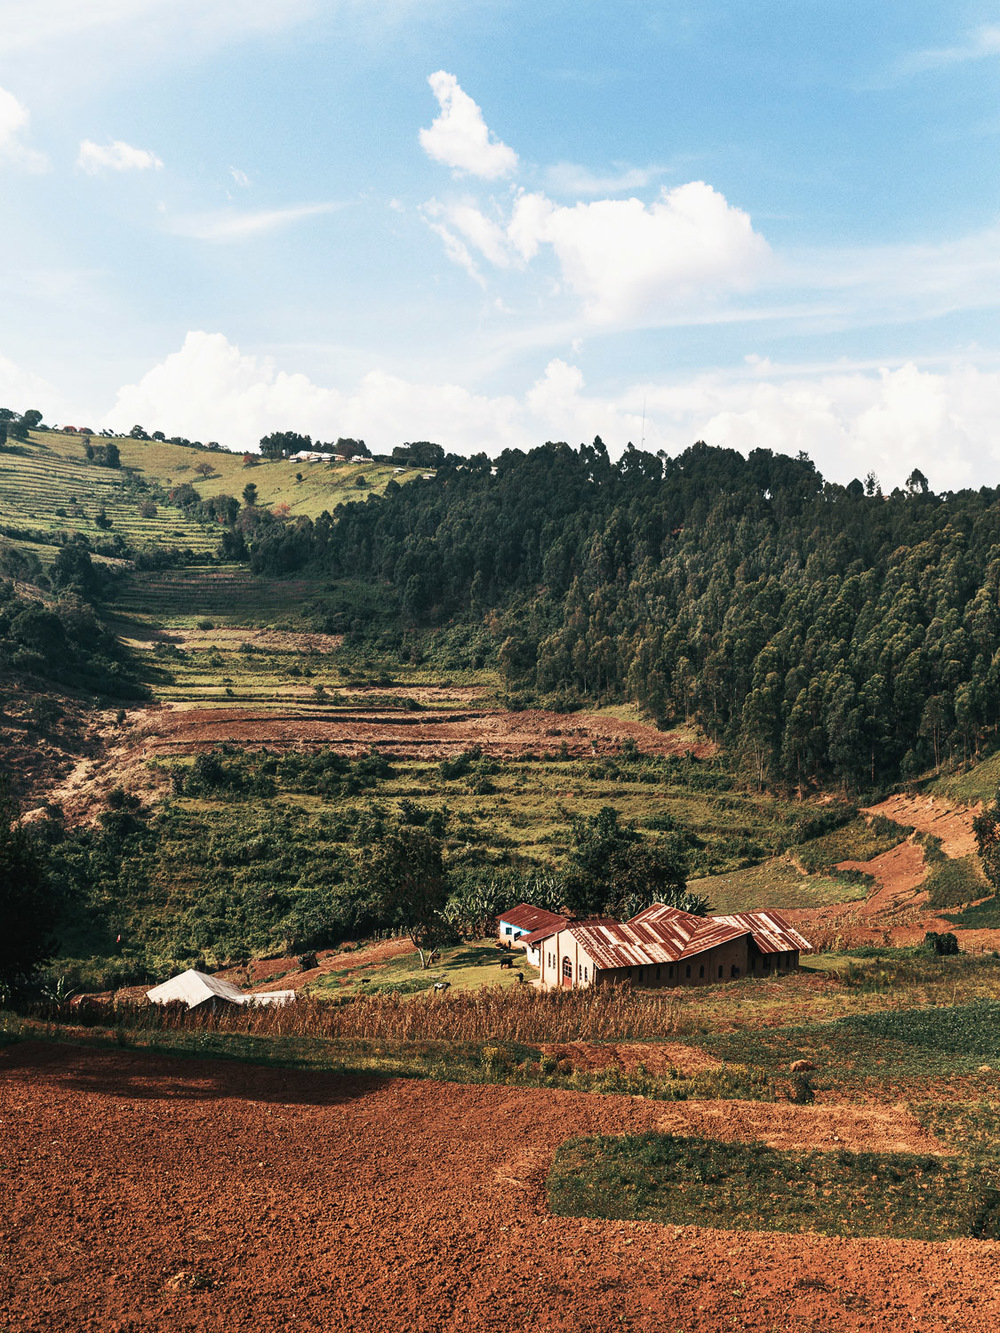 CallieGiovanna_Africa_Uganda_LakeBunyonyi_20150101_09197.jpg